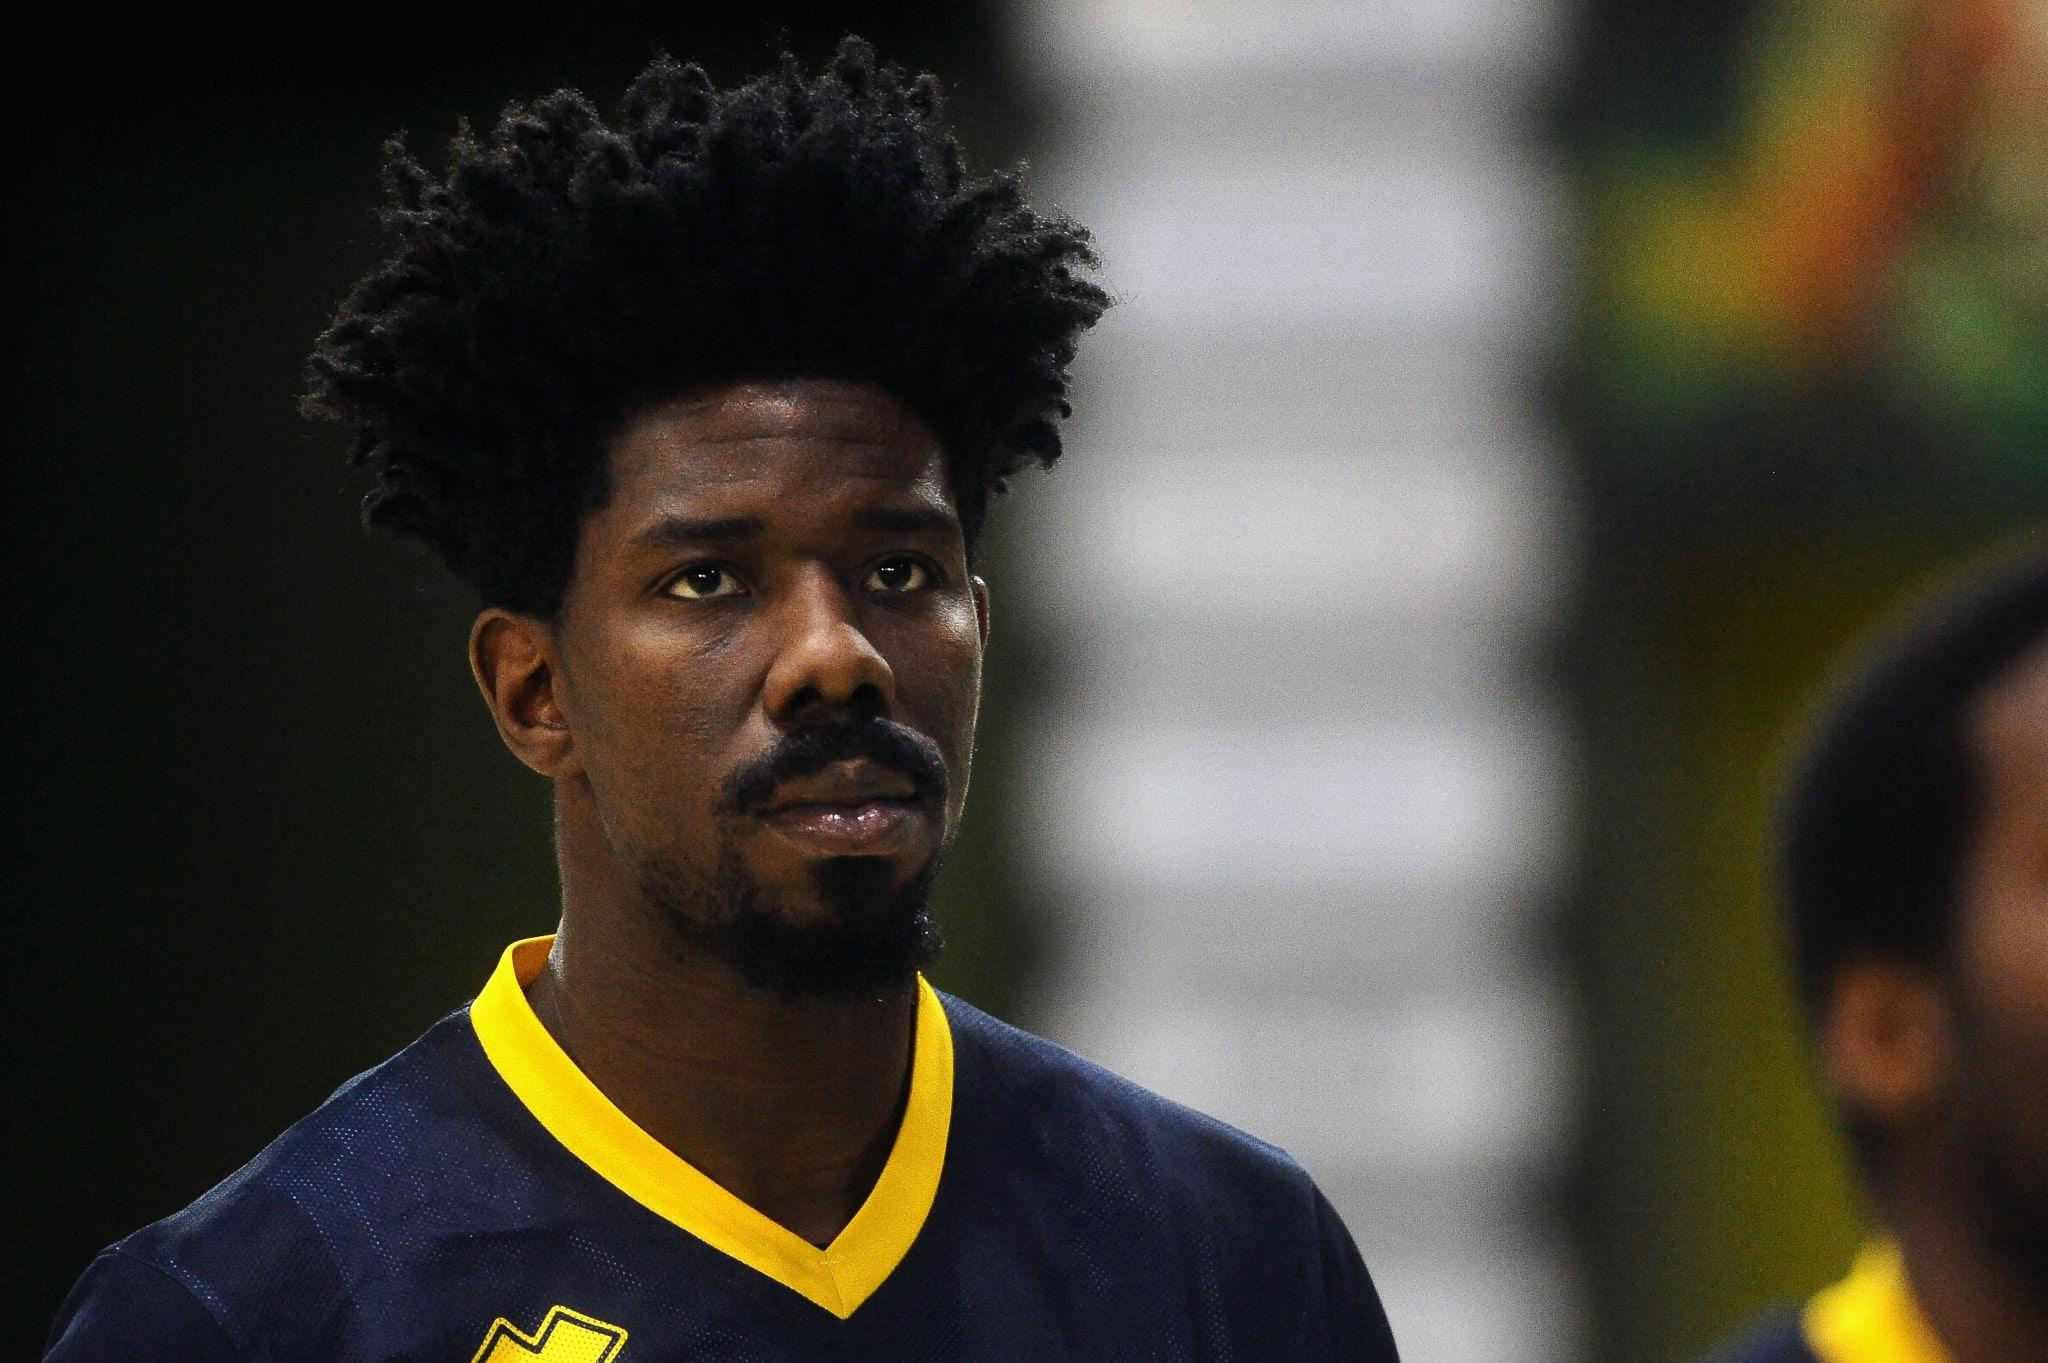 De' Longhi Treviso Basket: Il centro USA e' Henry Sims